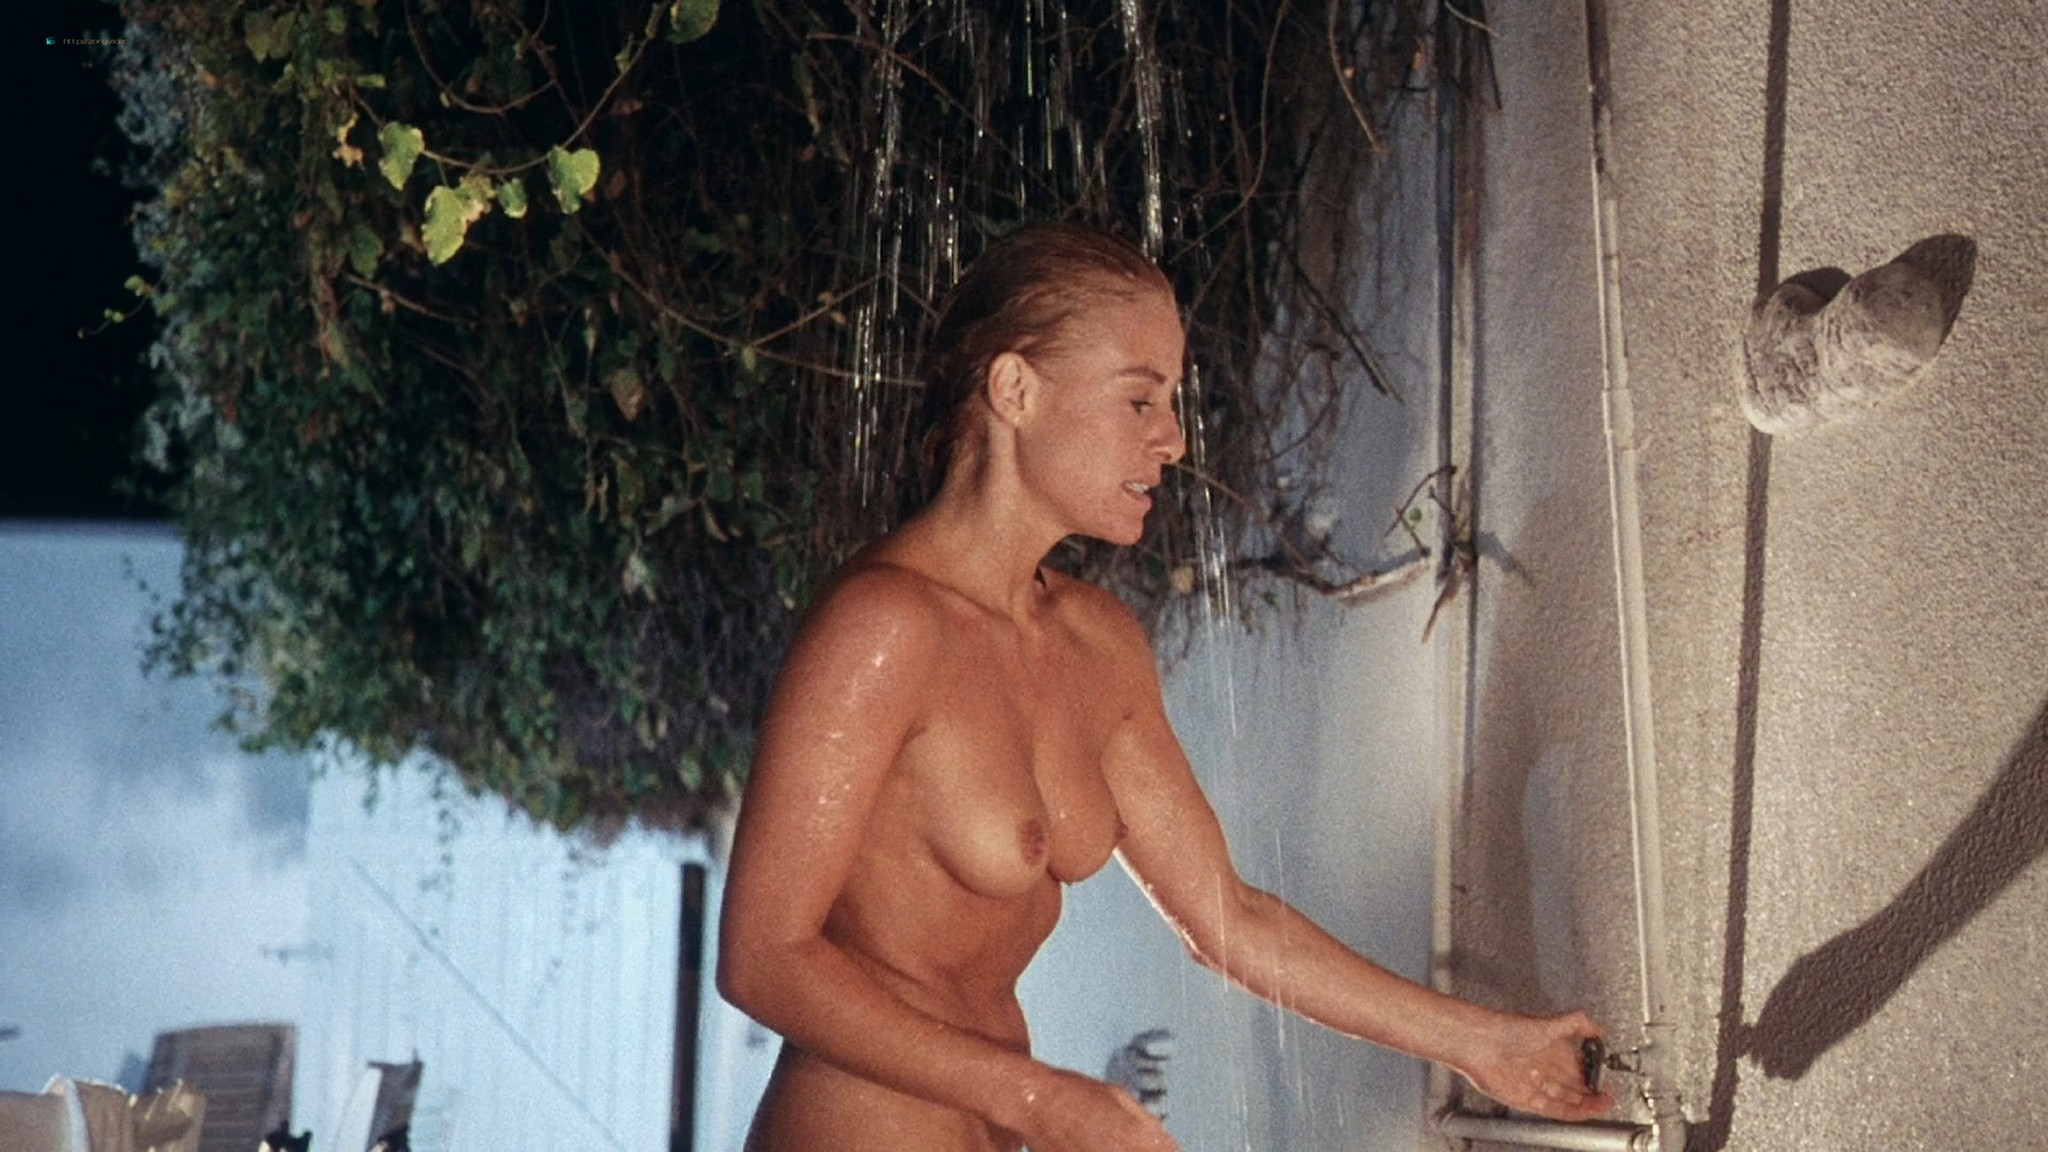 Belinda Mayne nude full frontal - White Fire (1984) HD 1080p BluRay (11)